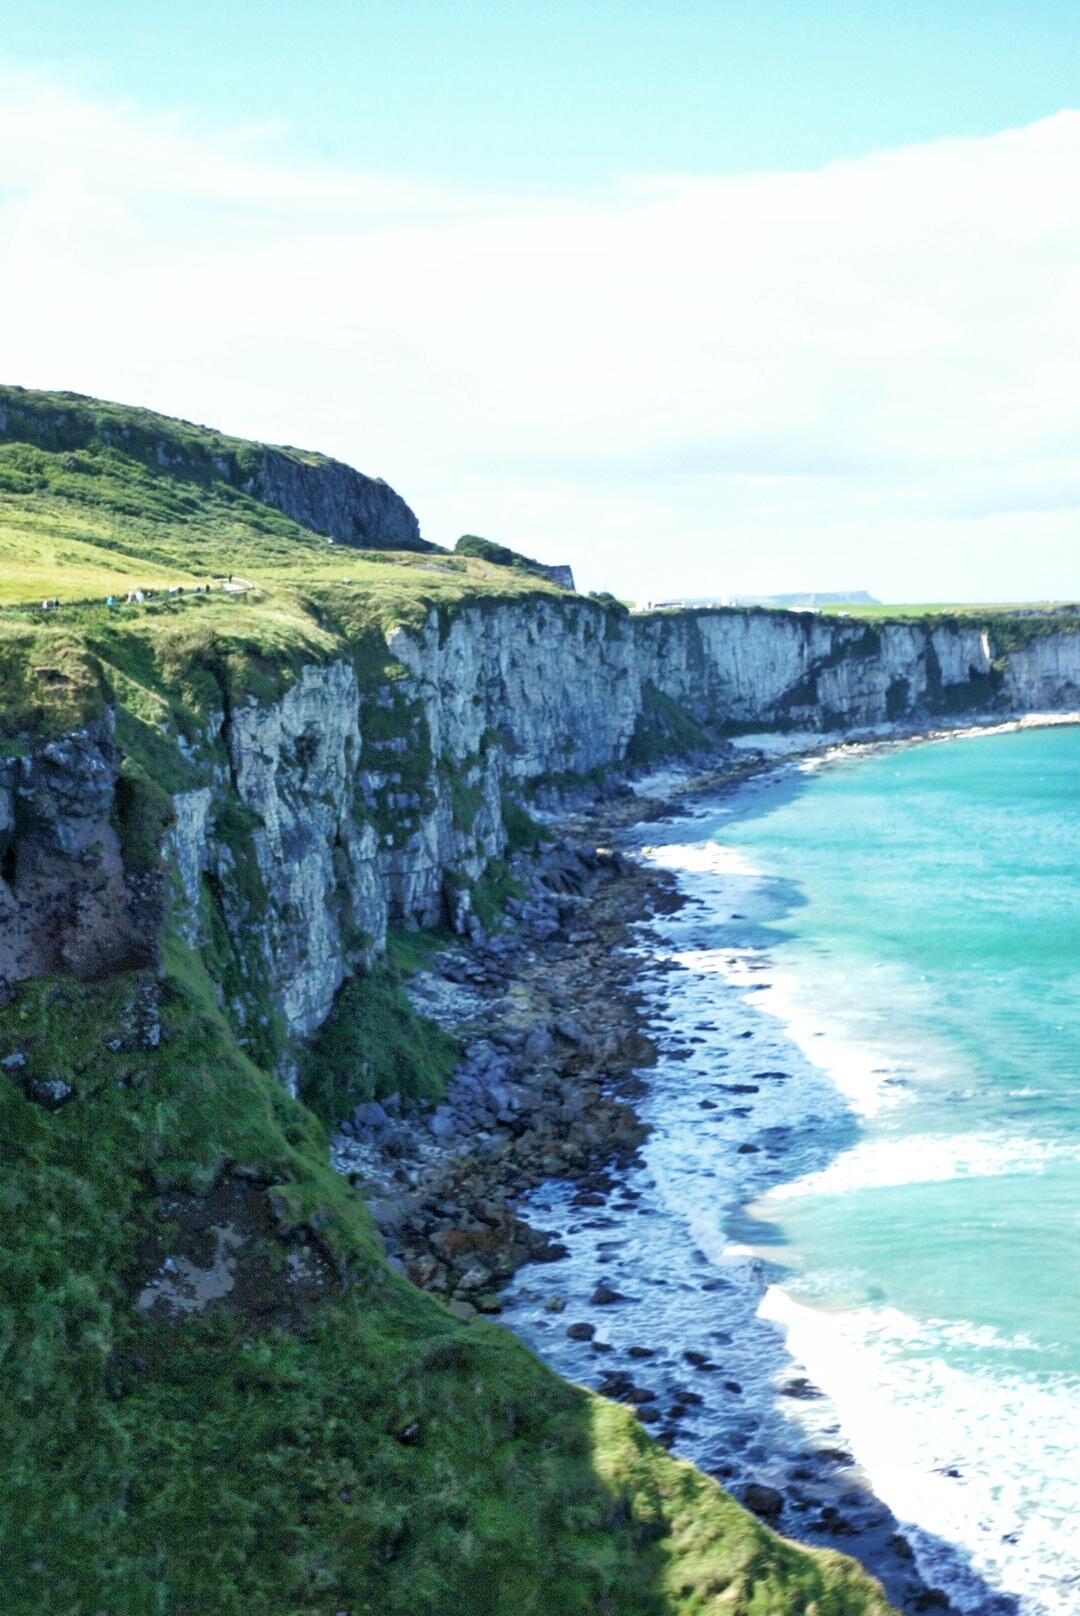 ireland places visit amazing northern antrim county causeway giant five cliffs